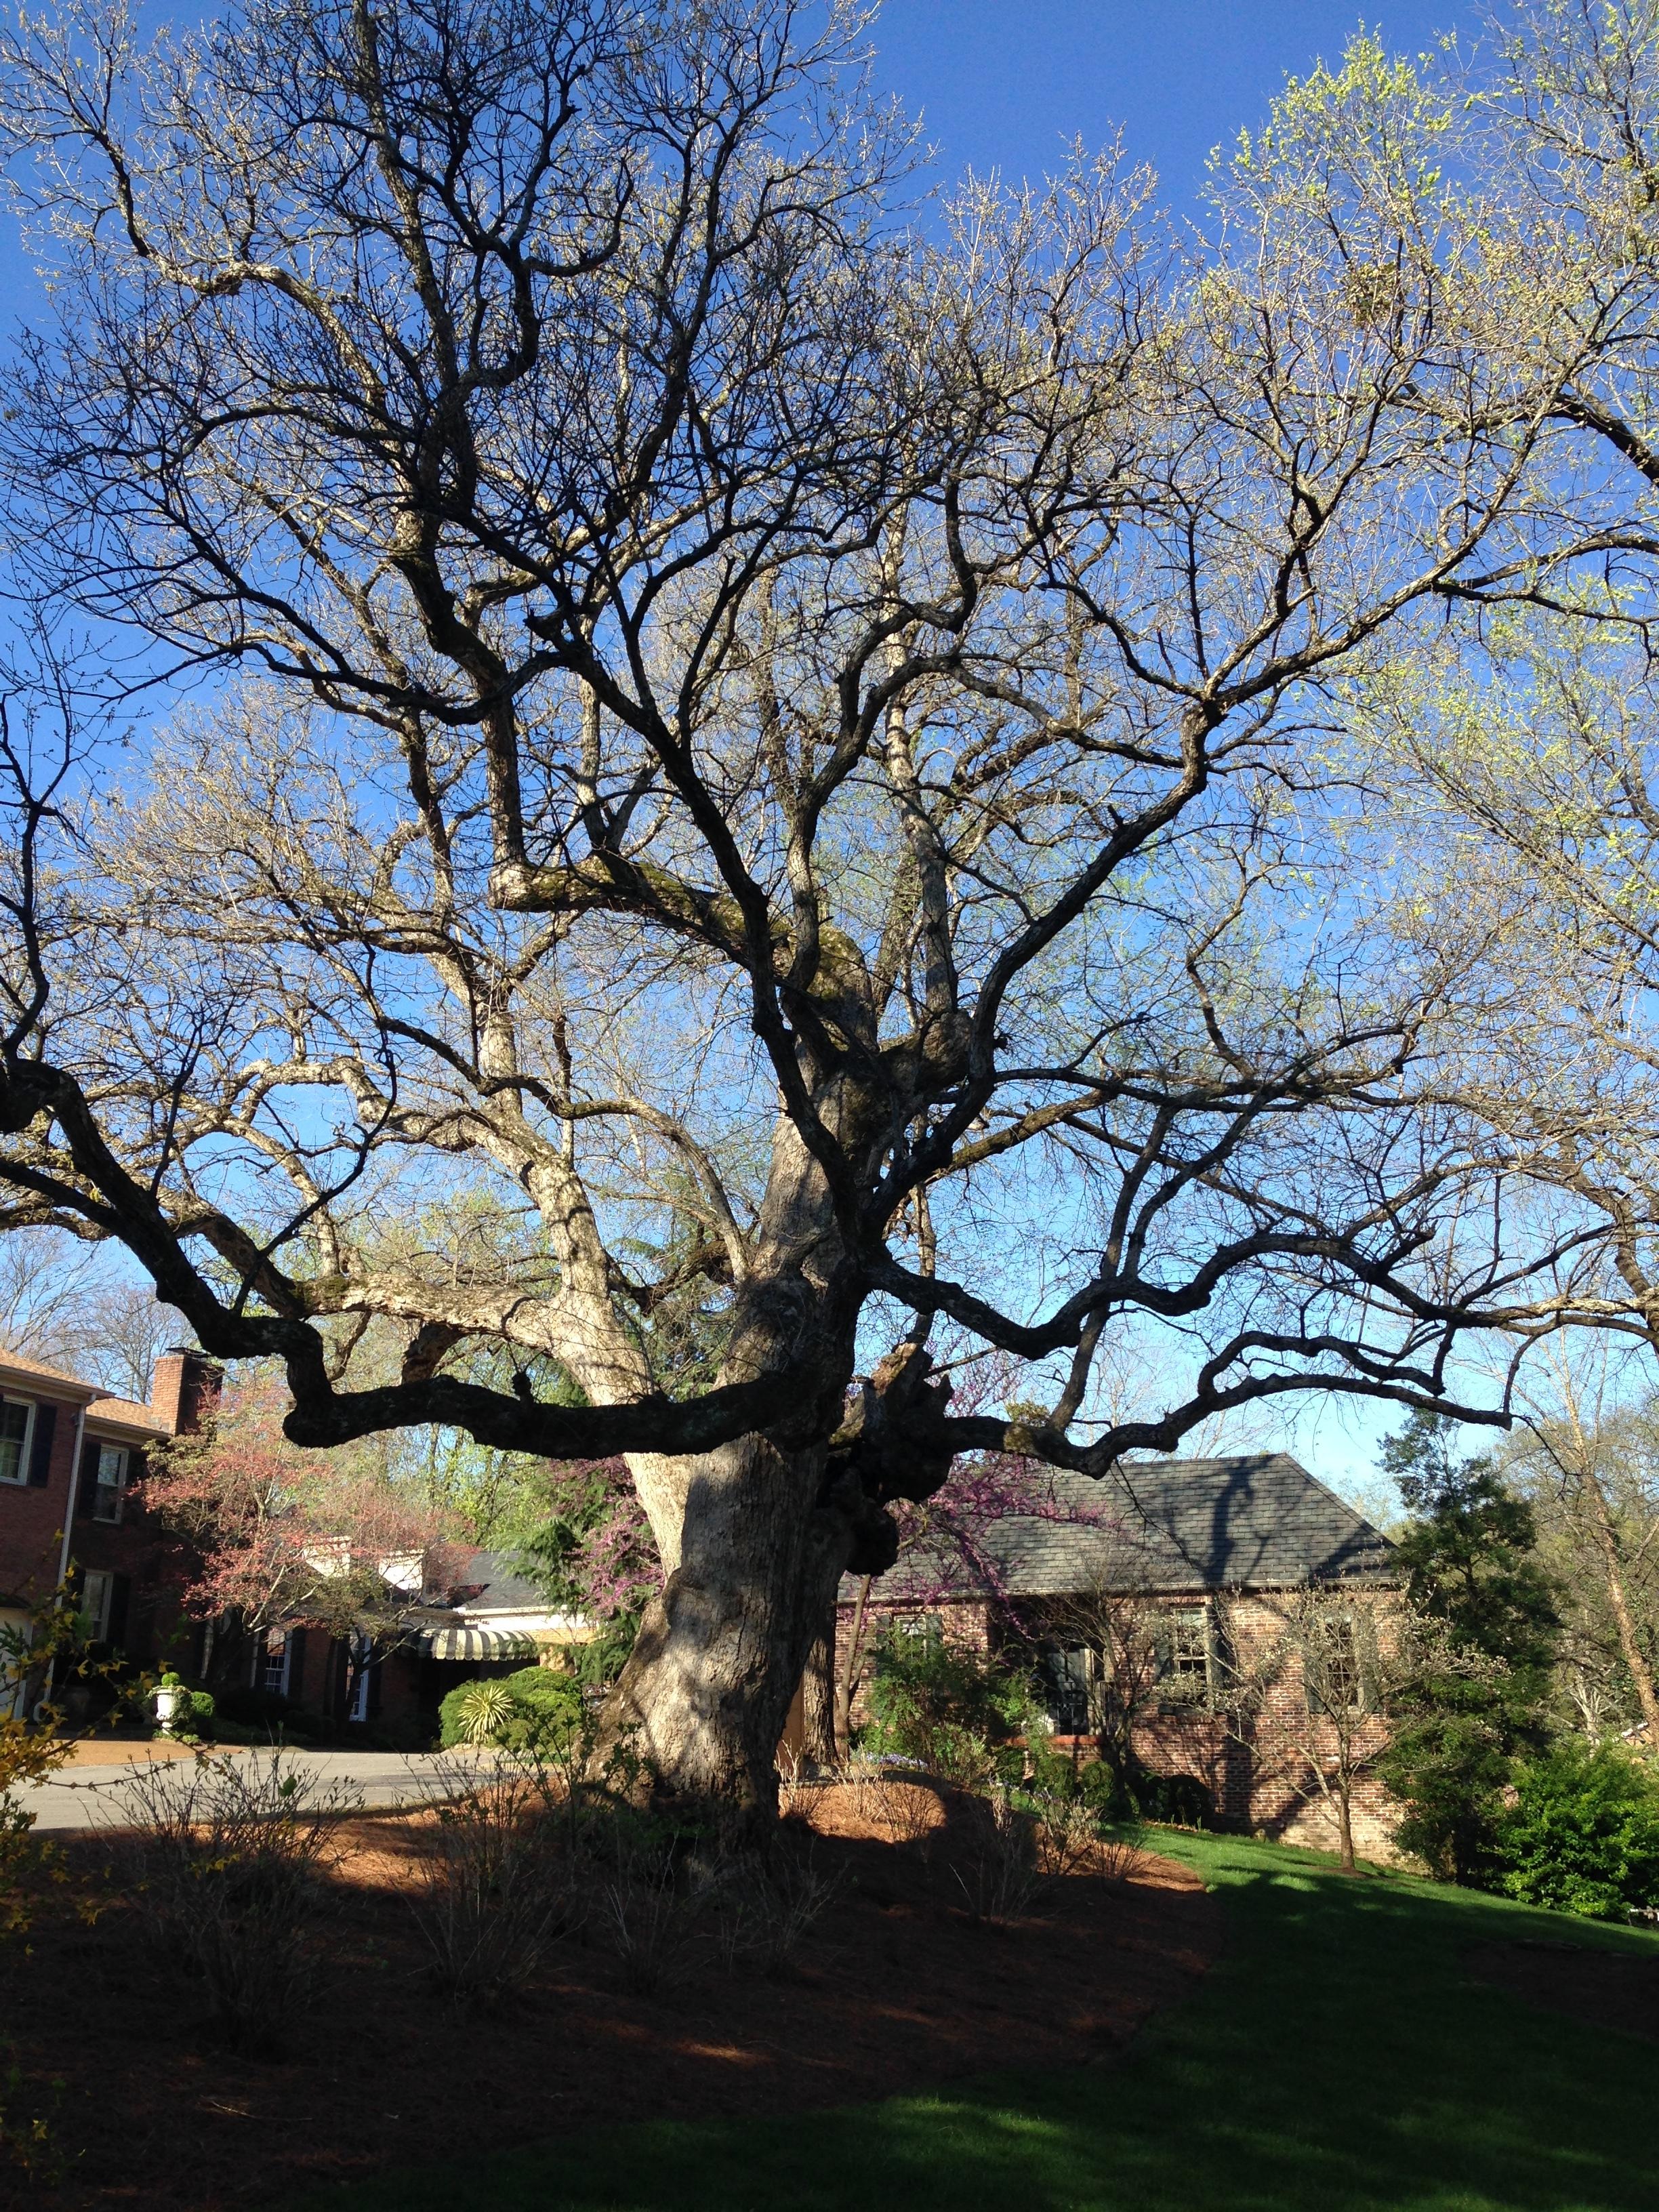 Chinkapin Oak (Quercus muehlenbergii)